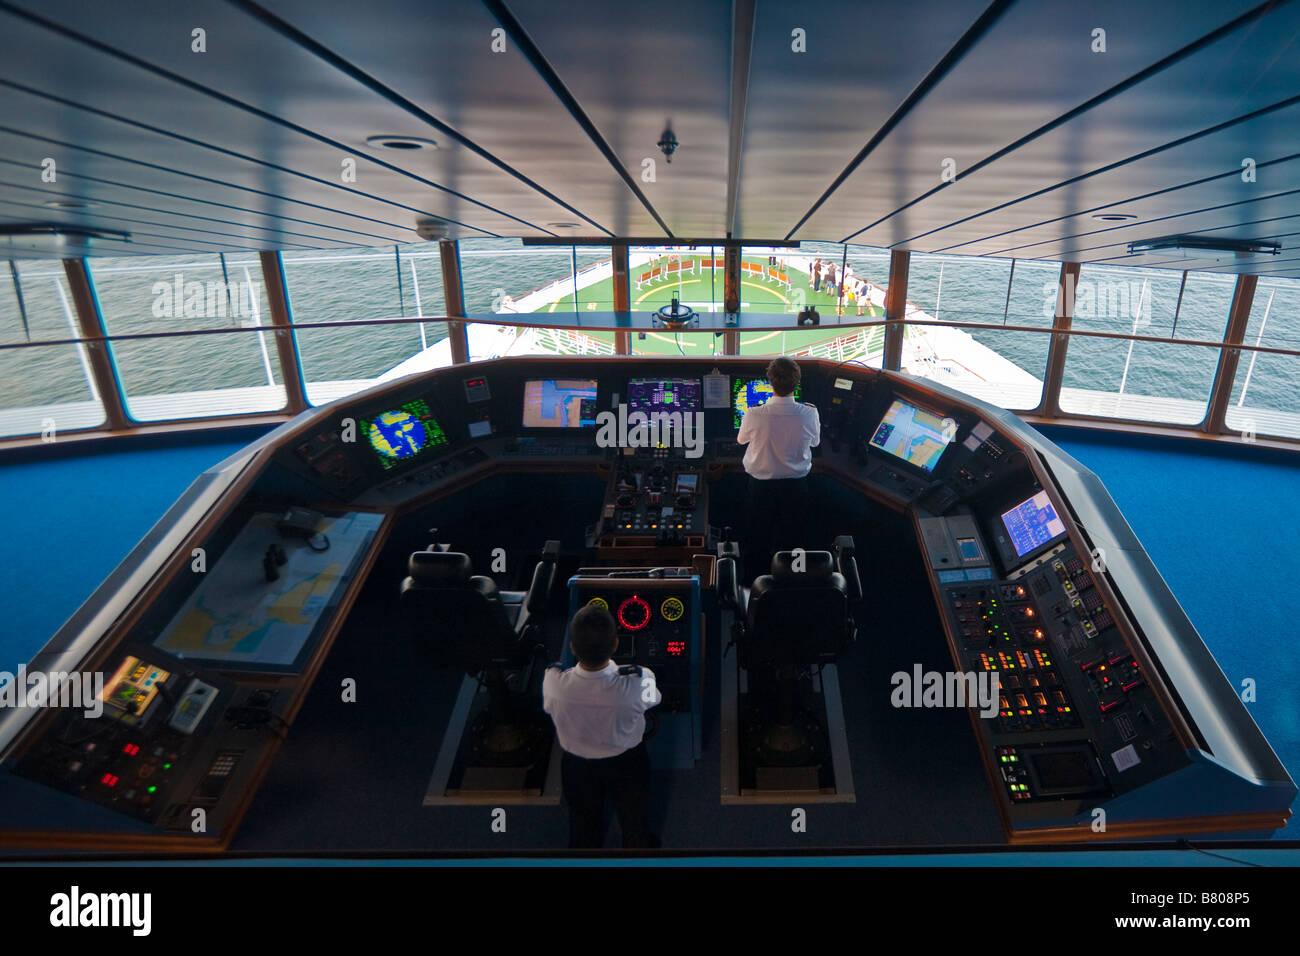 Crew members in the Bridge of Royal Caribbean's Navigator of the Seas cruise ship - Stock Image